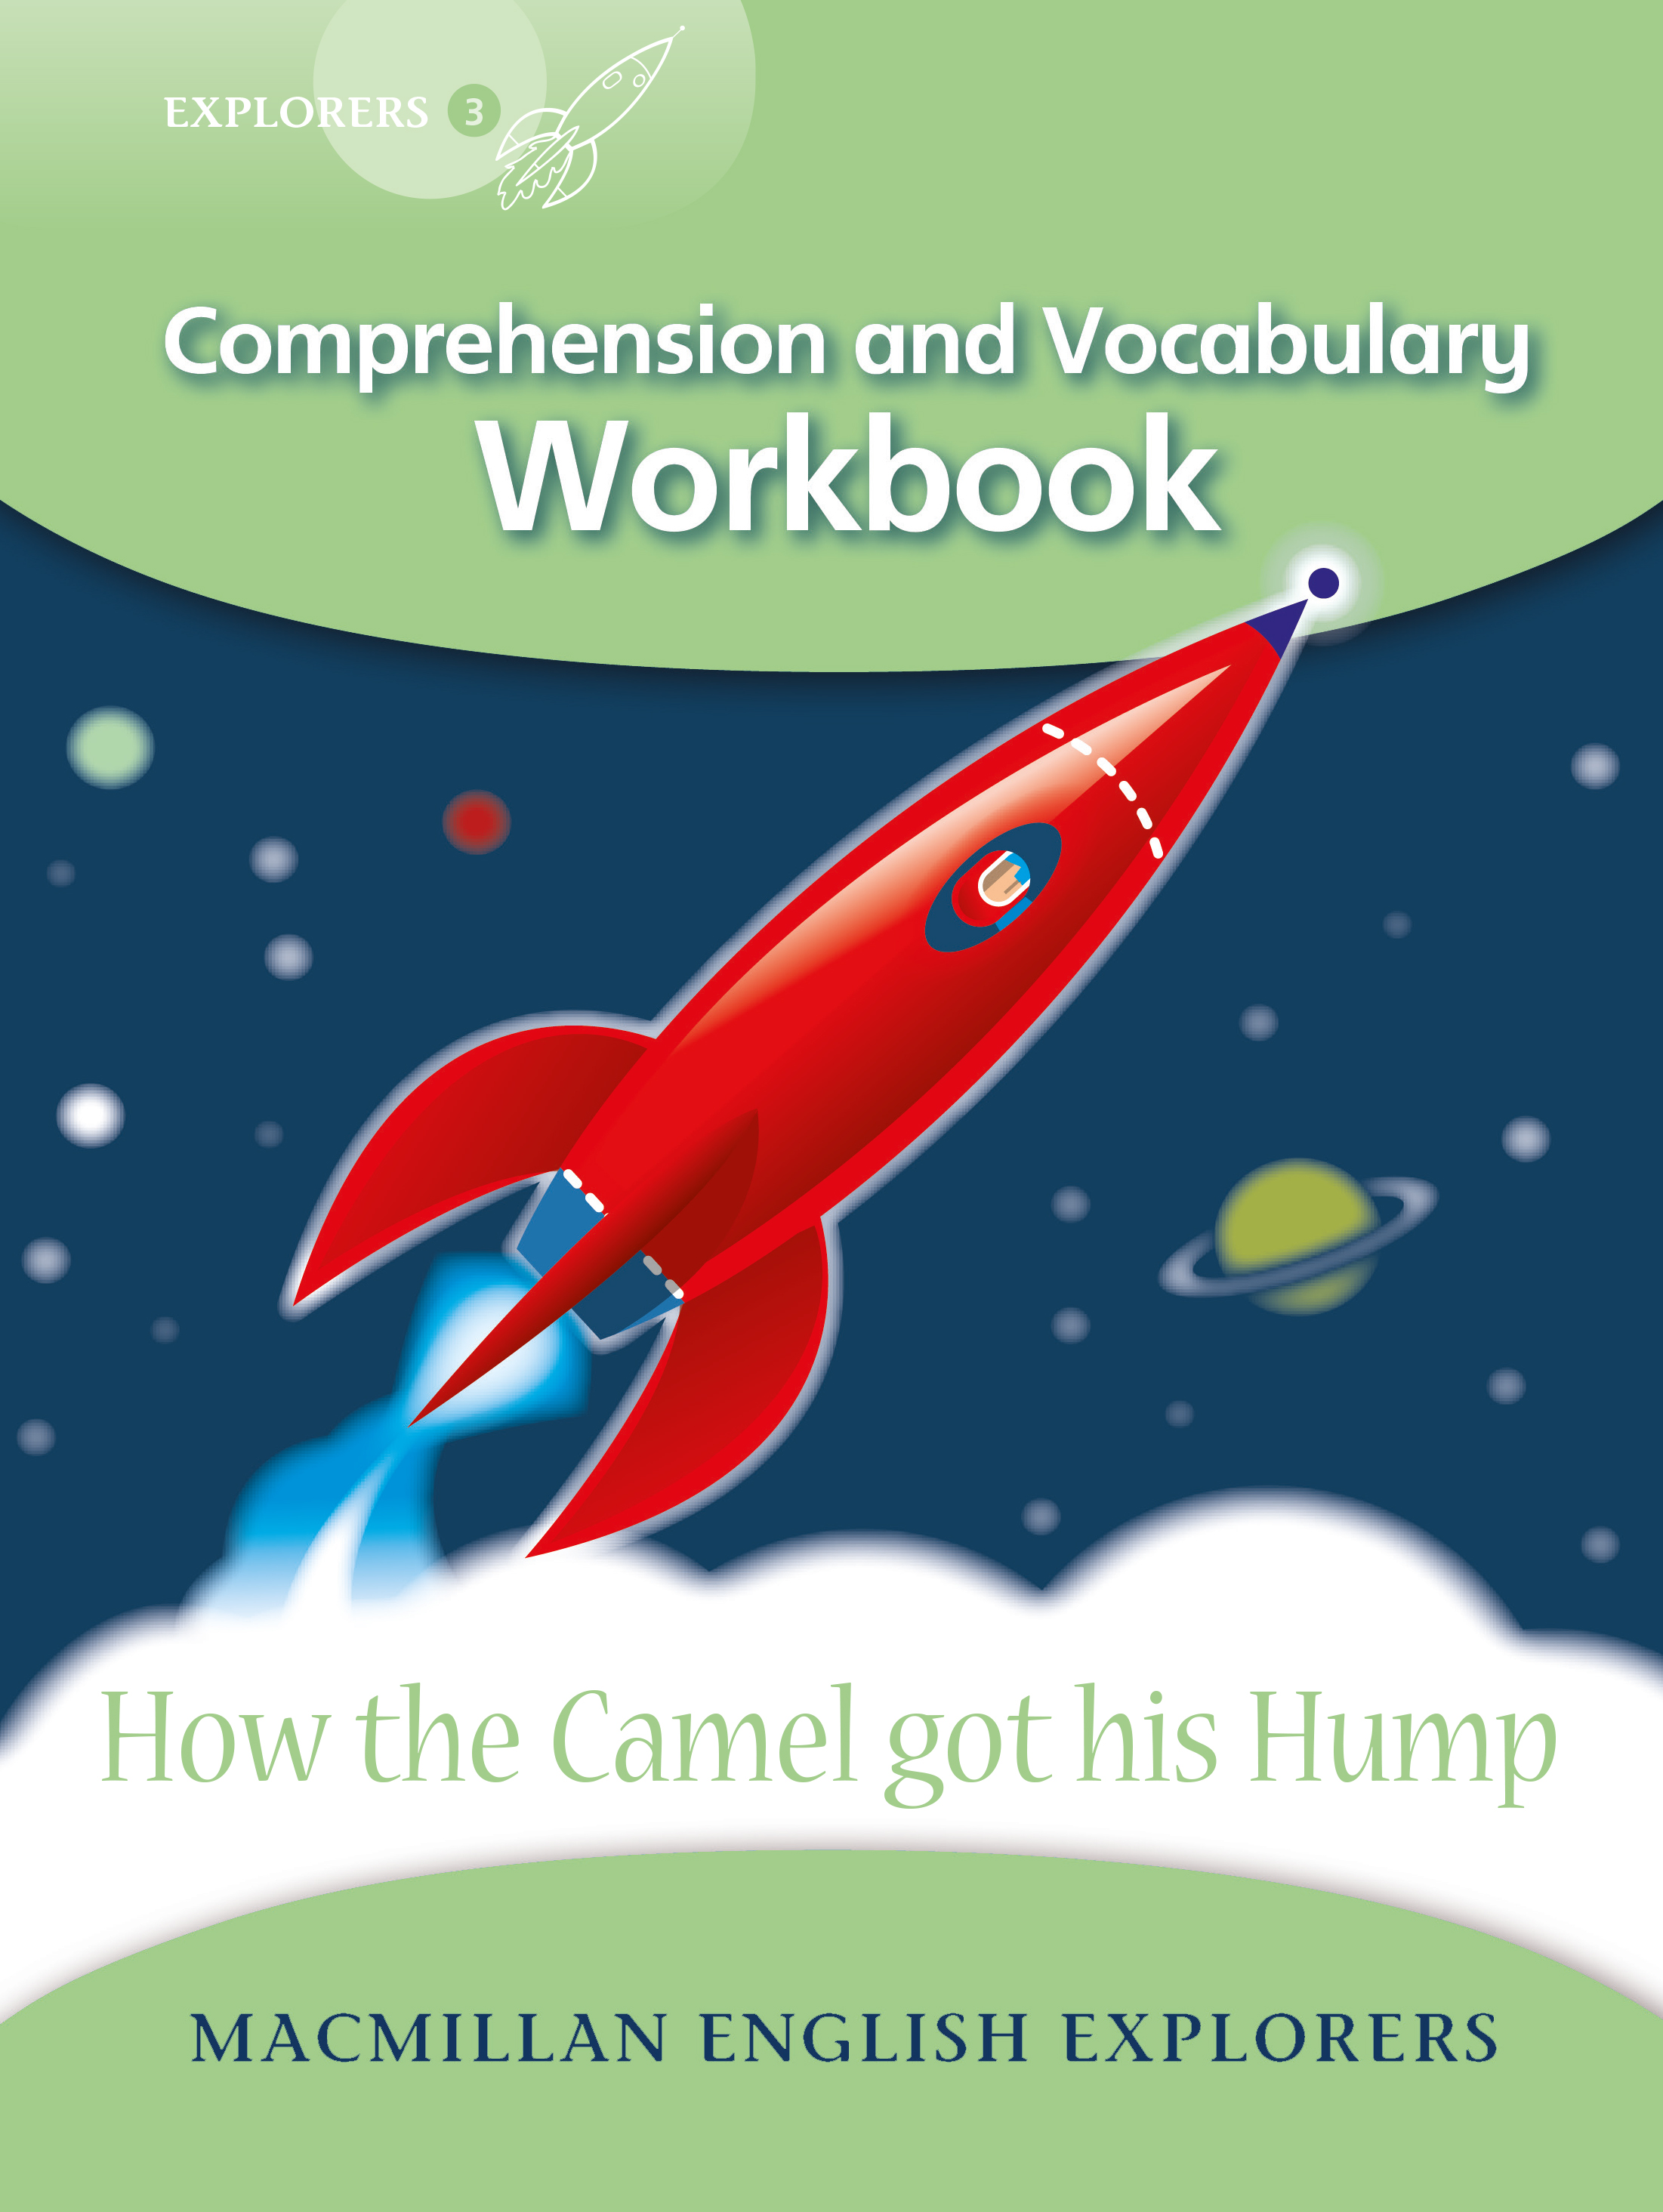 Explorers 3: How the Camel Got His Hump Workbook